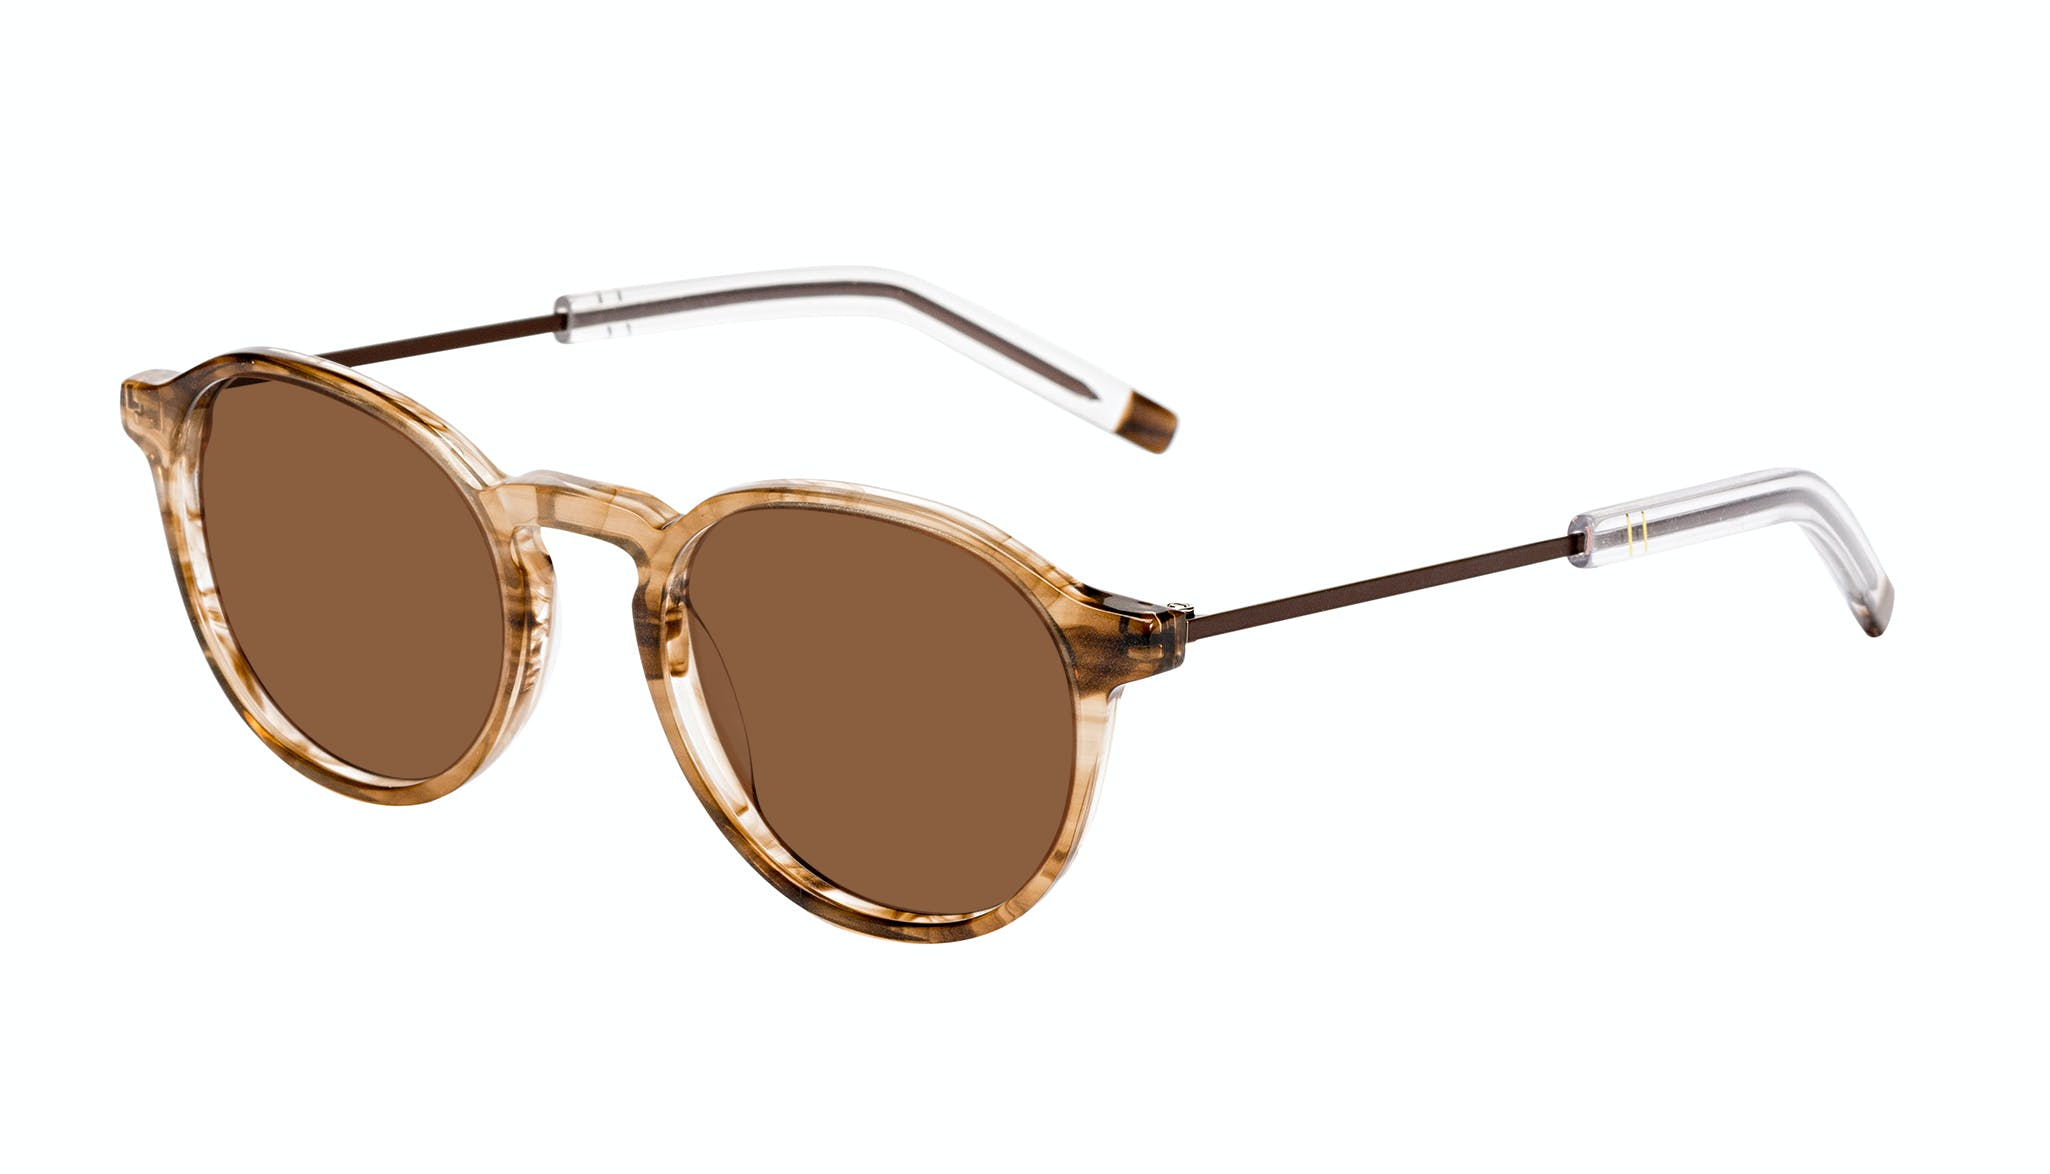 Affordable Fashion Glasses Round Sunglasses Men Prime Smokey Havana Tilt